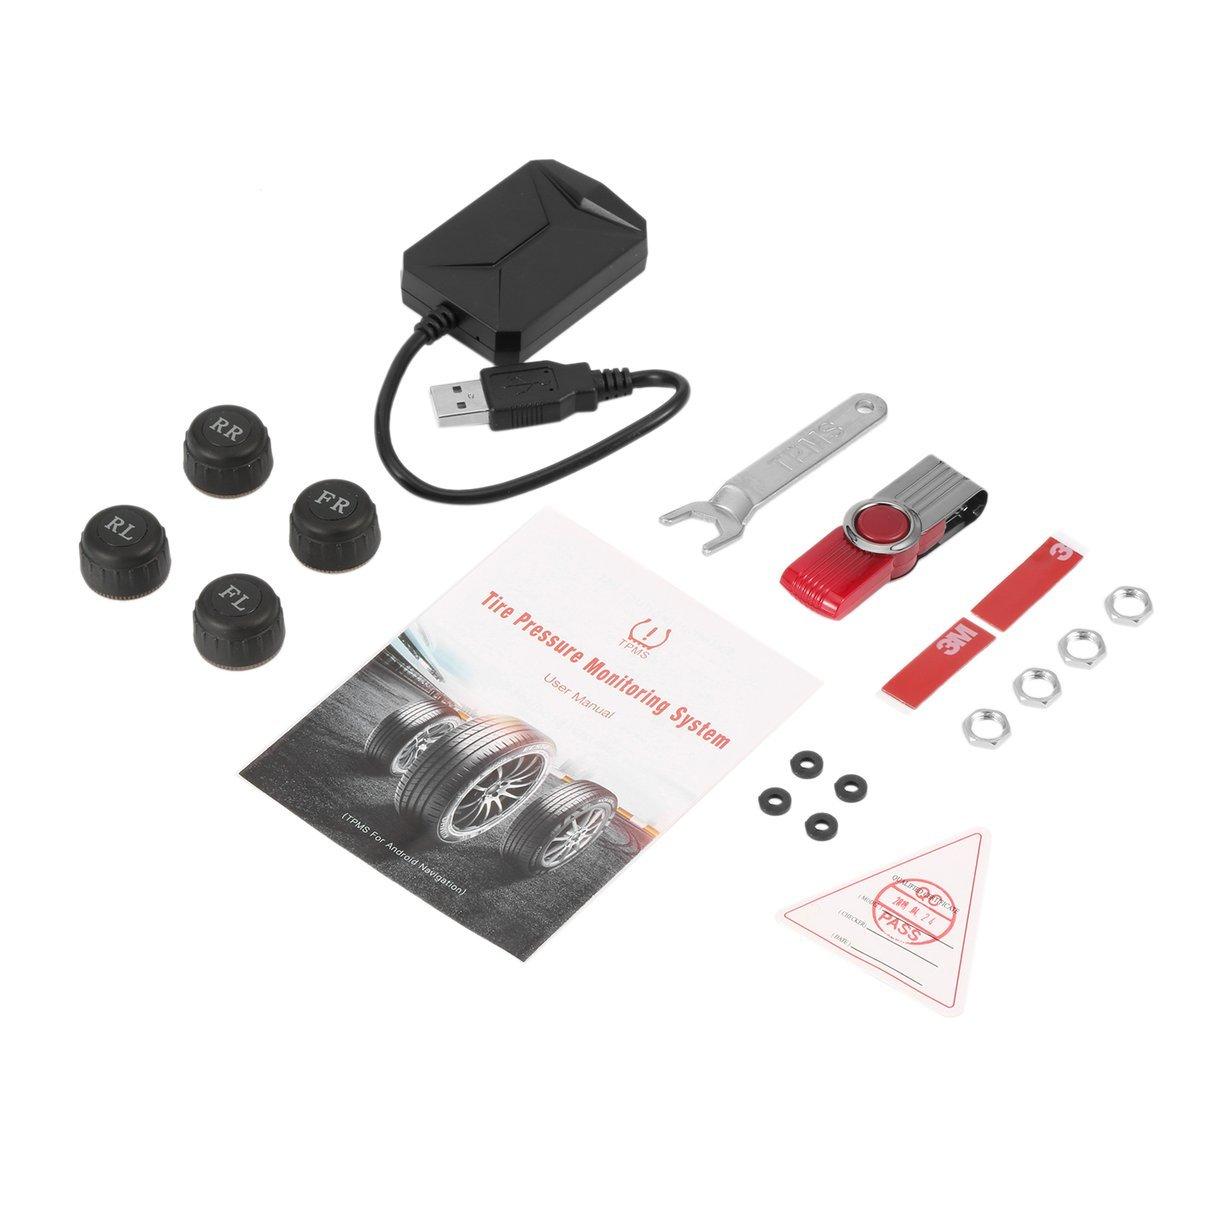 Detectoy 4xExternal Sensoren, Universal USB Auto TPMS Android Reifendruckkontrollsystem mit 4 externen Sensoren Auto Security Alarm Systems